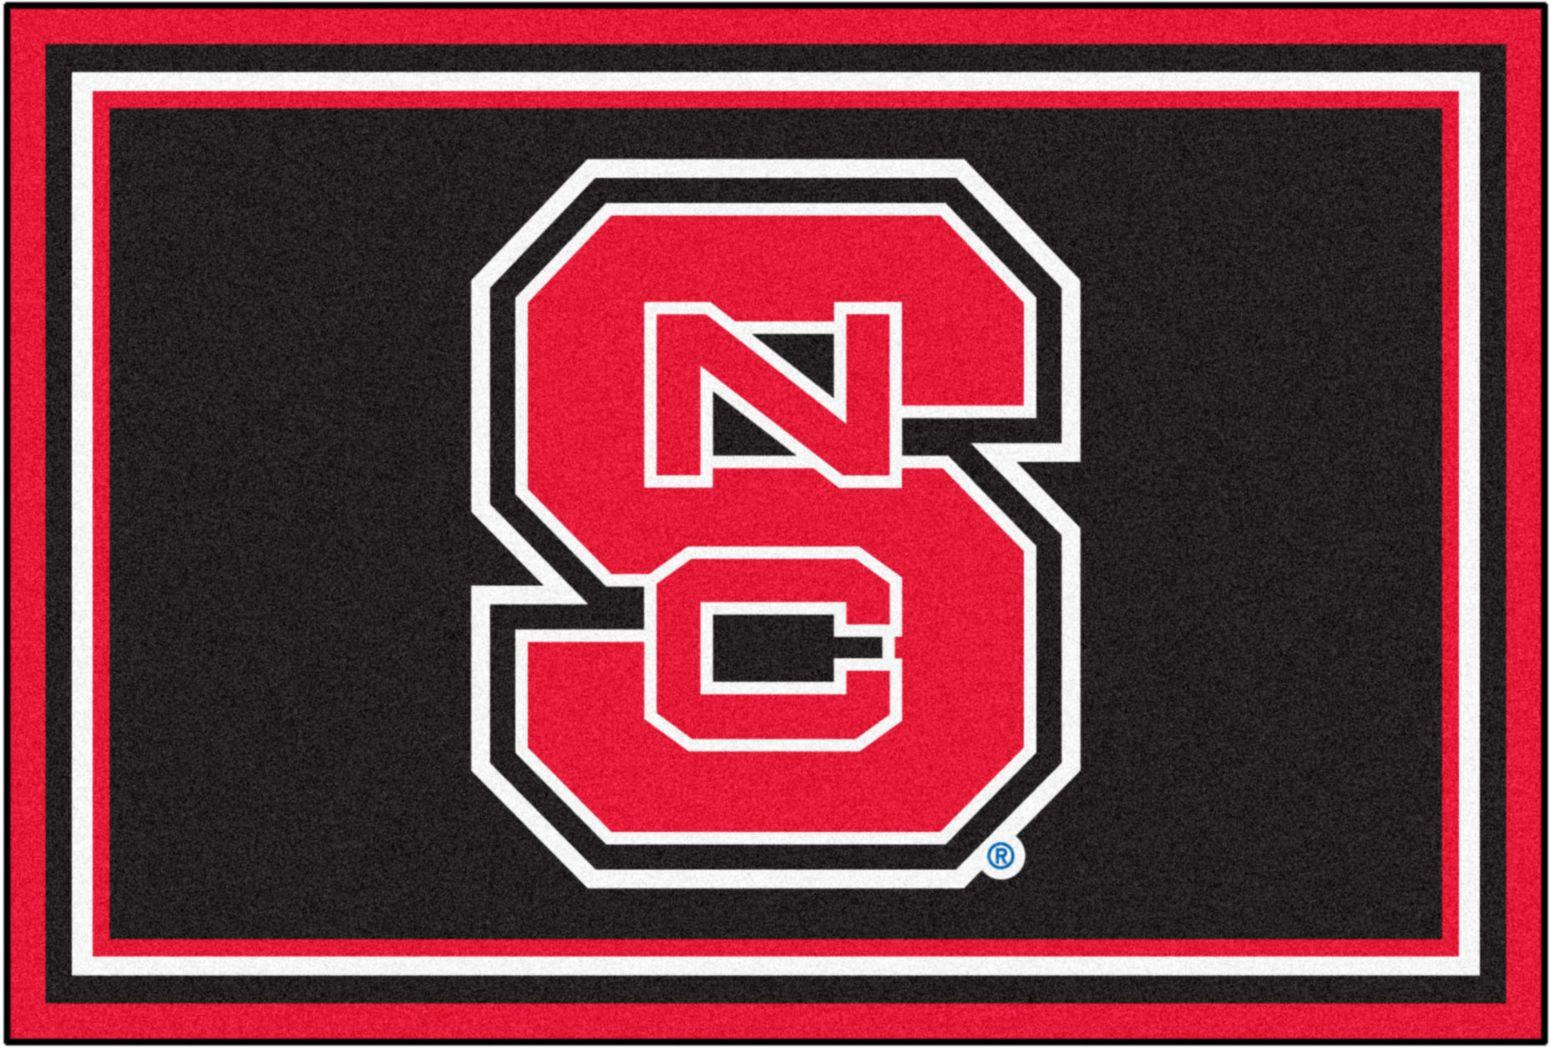 NCAA Big Game North Carolina State University 5' x 8' Rug